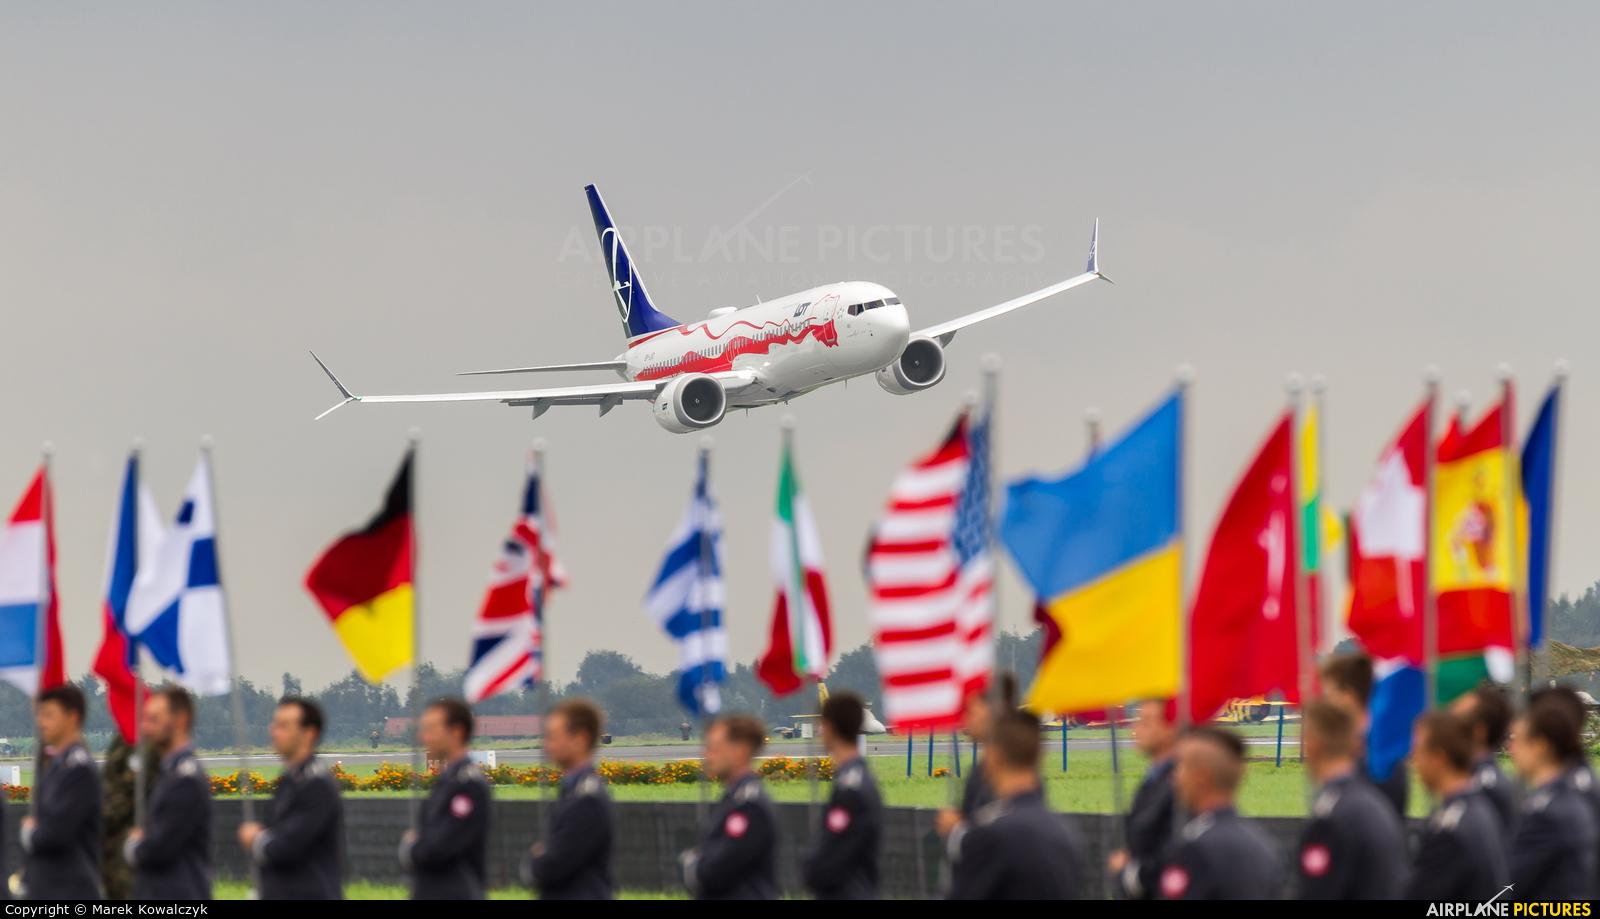 LOT - Polish Airlines SP-LVD aircraft at Radom - Sadków